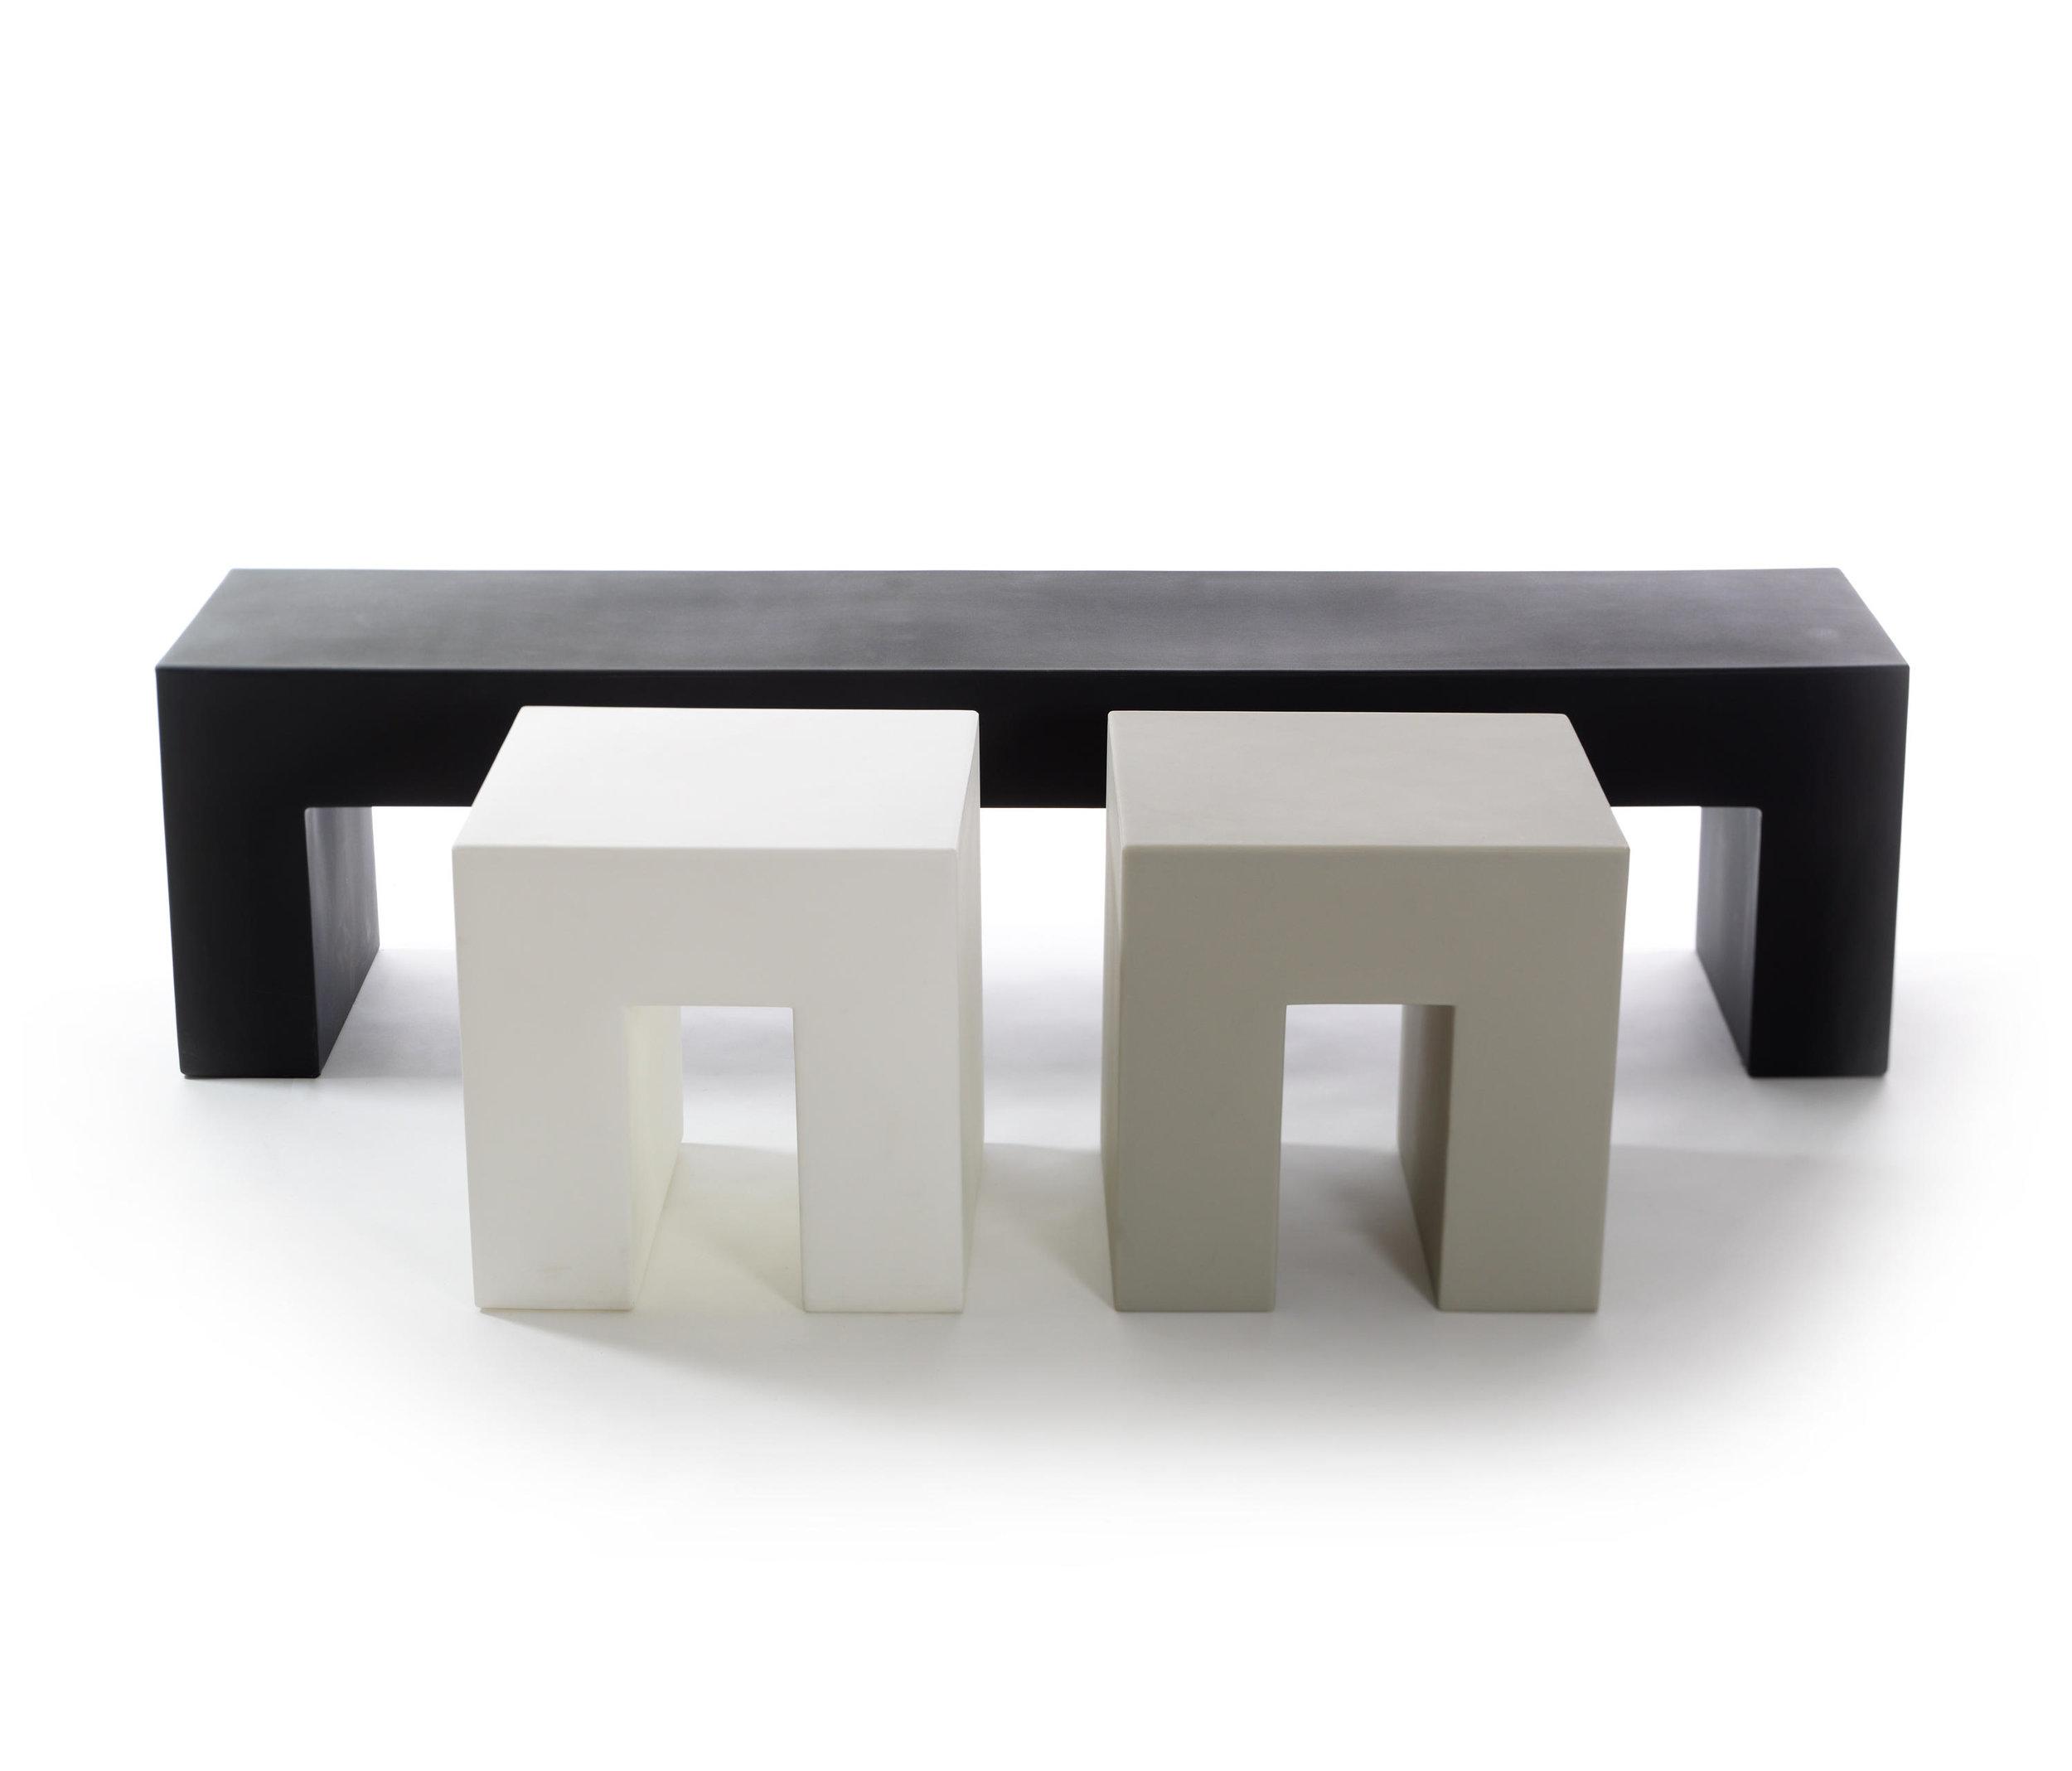 vignelli-benches-133-b.jpg